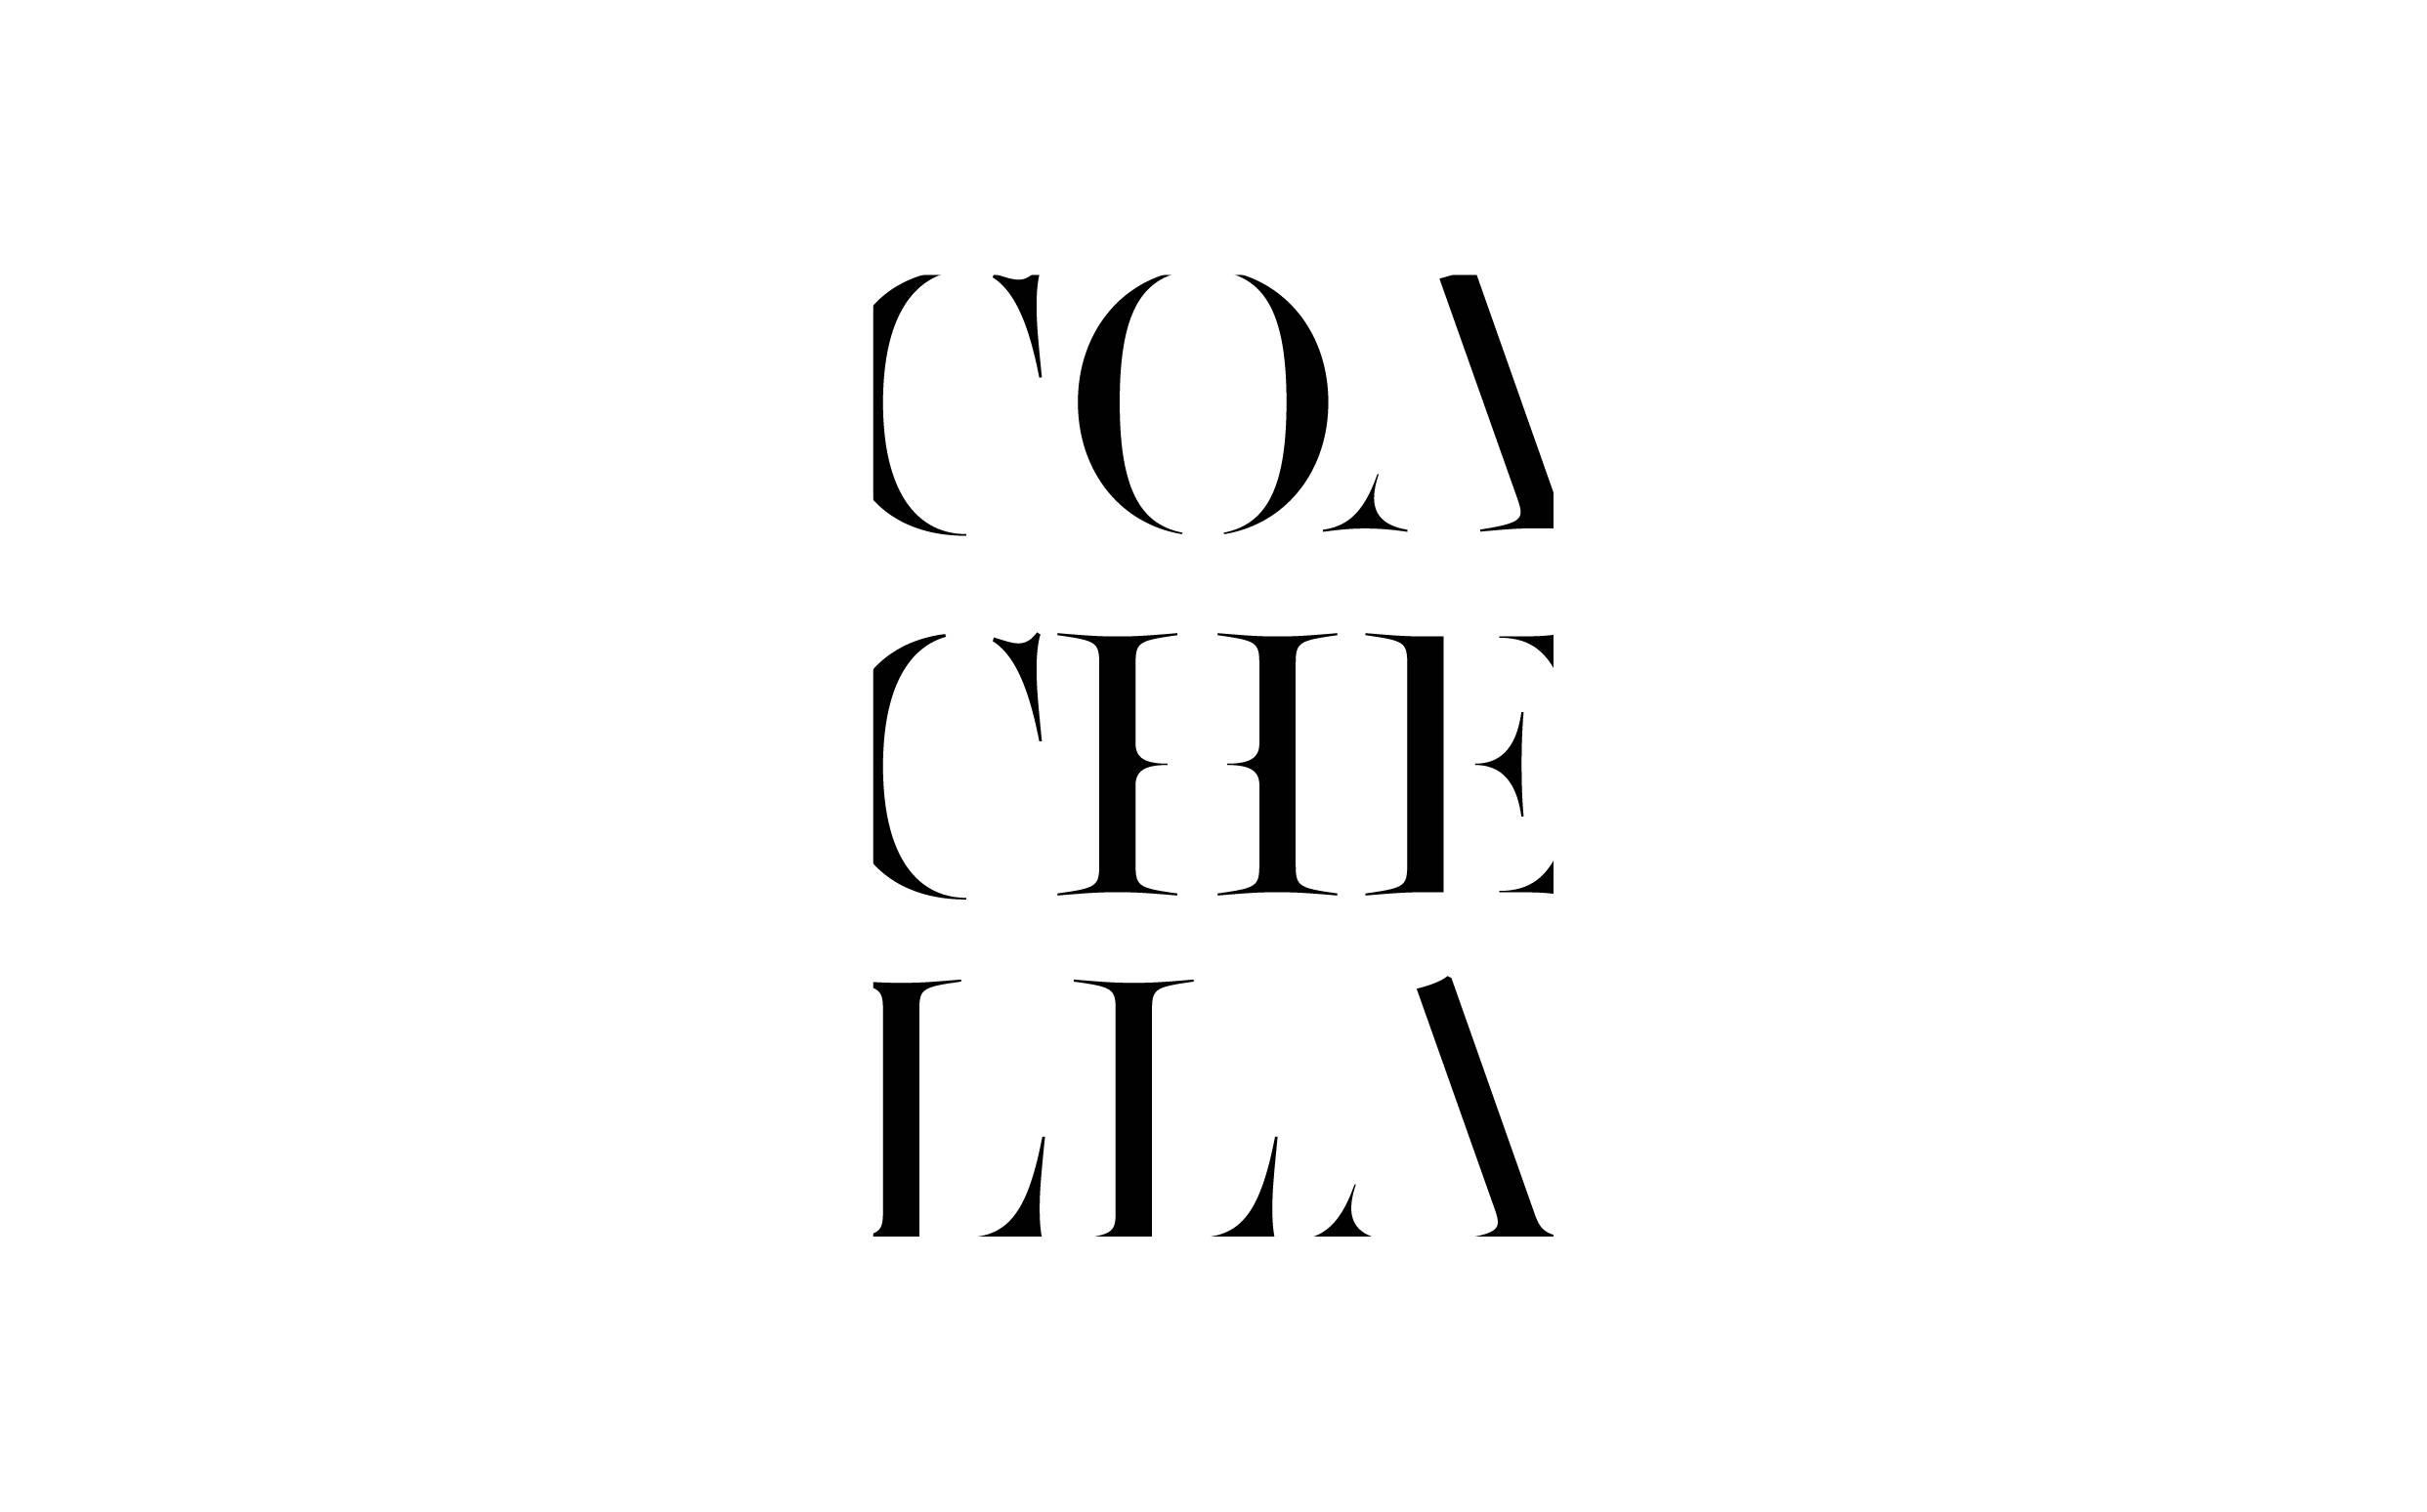 Coachella - Custom sexy type collection by Moshik Nadav Typography